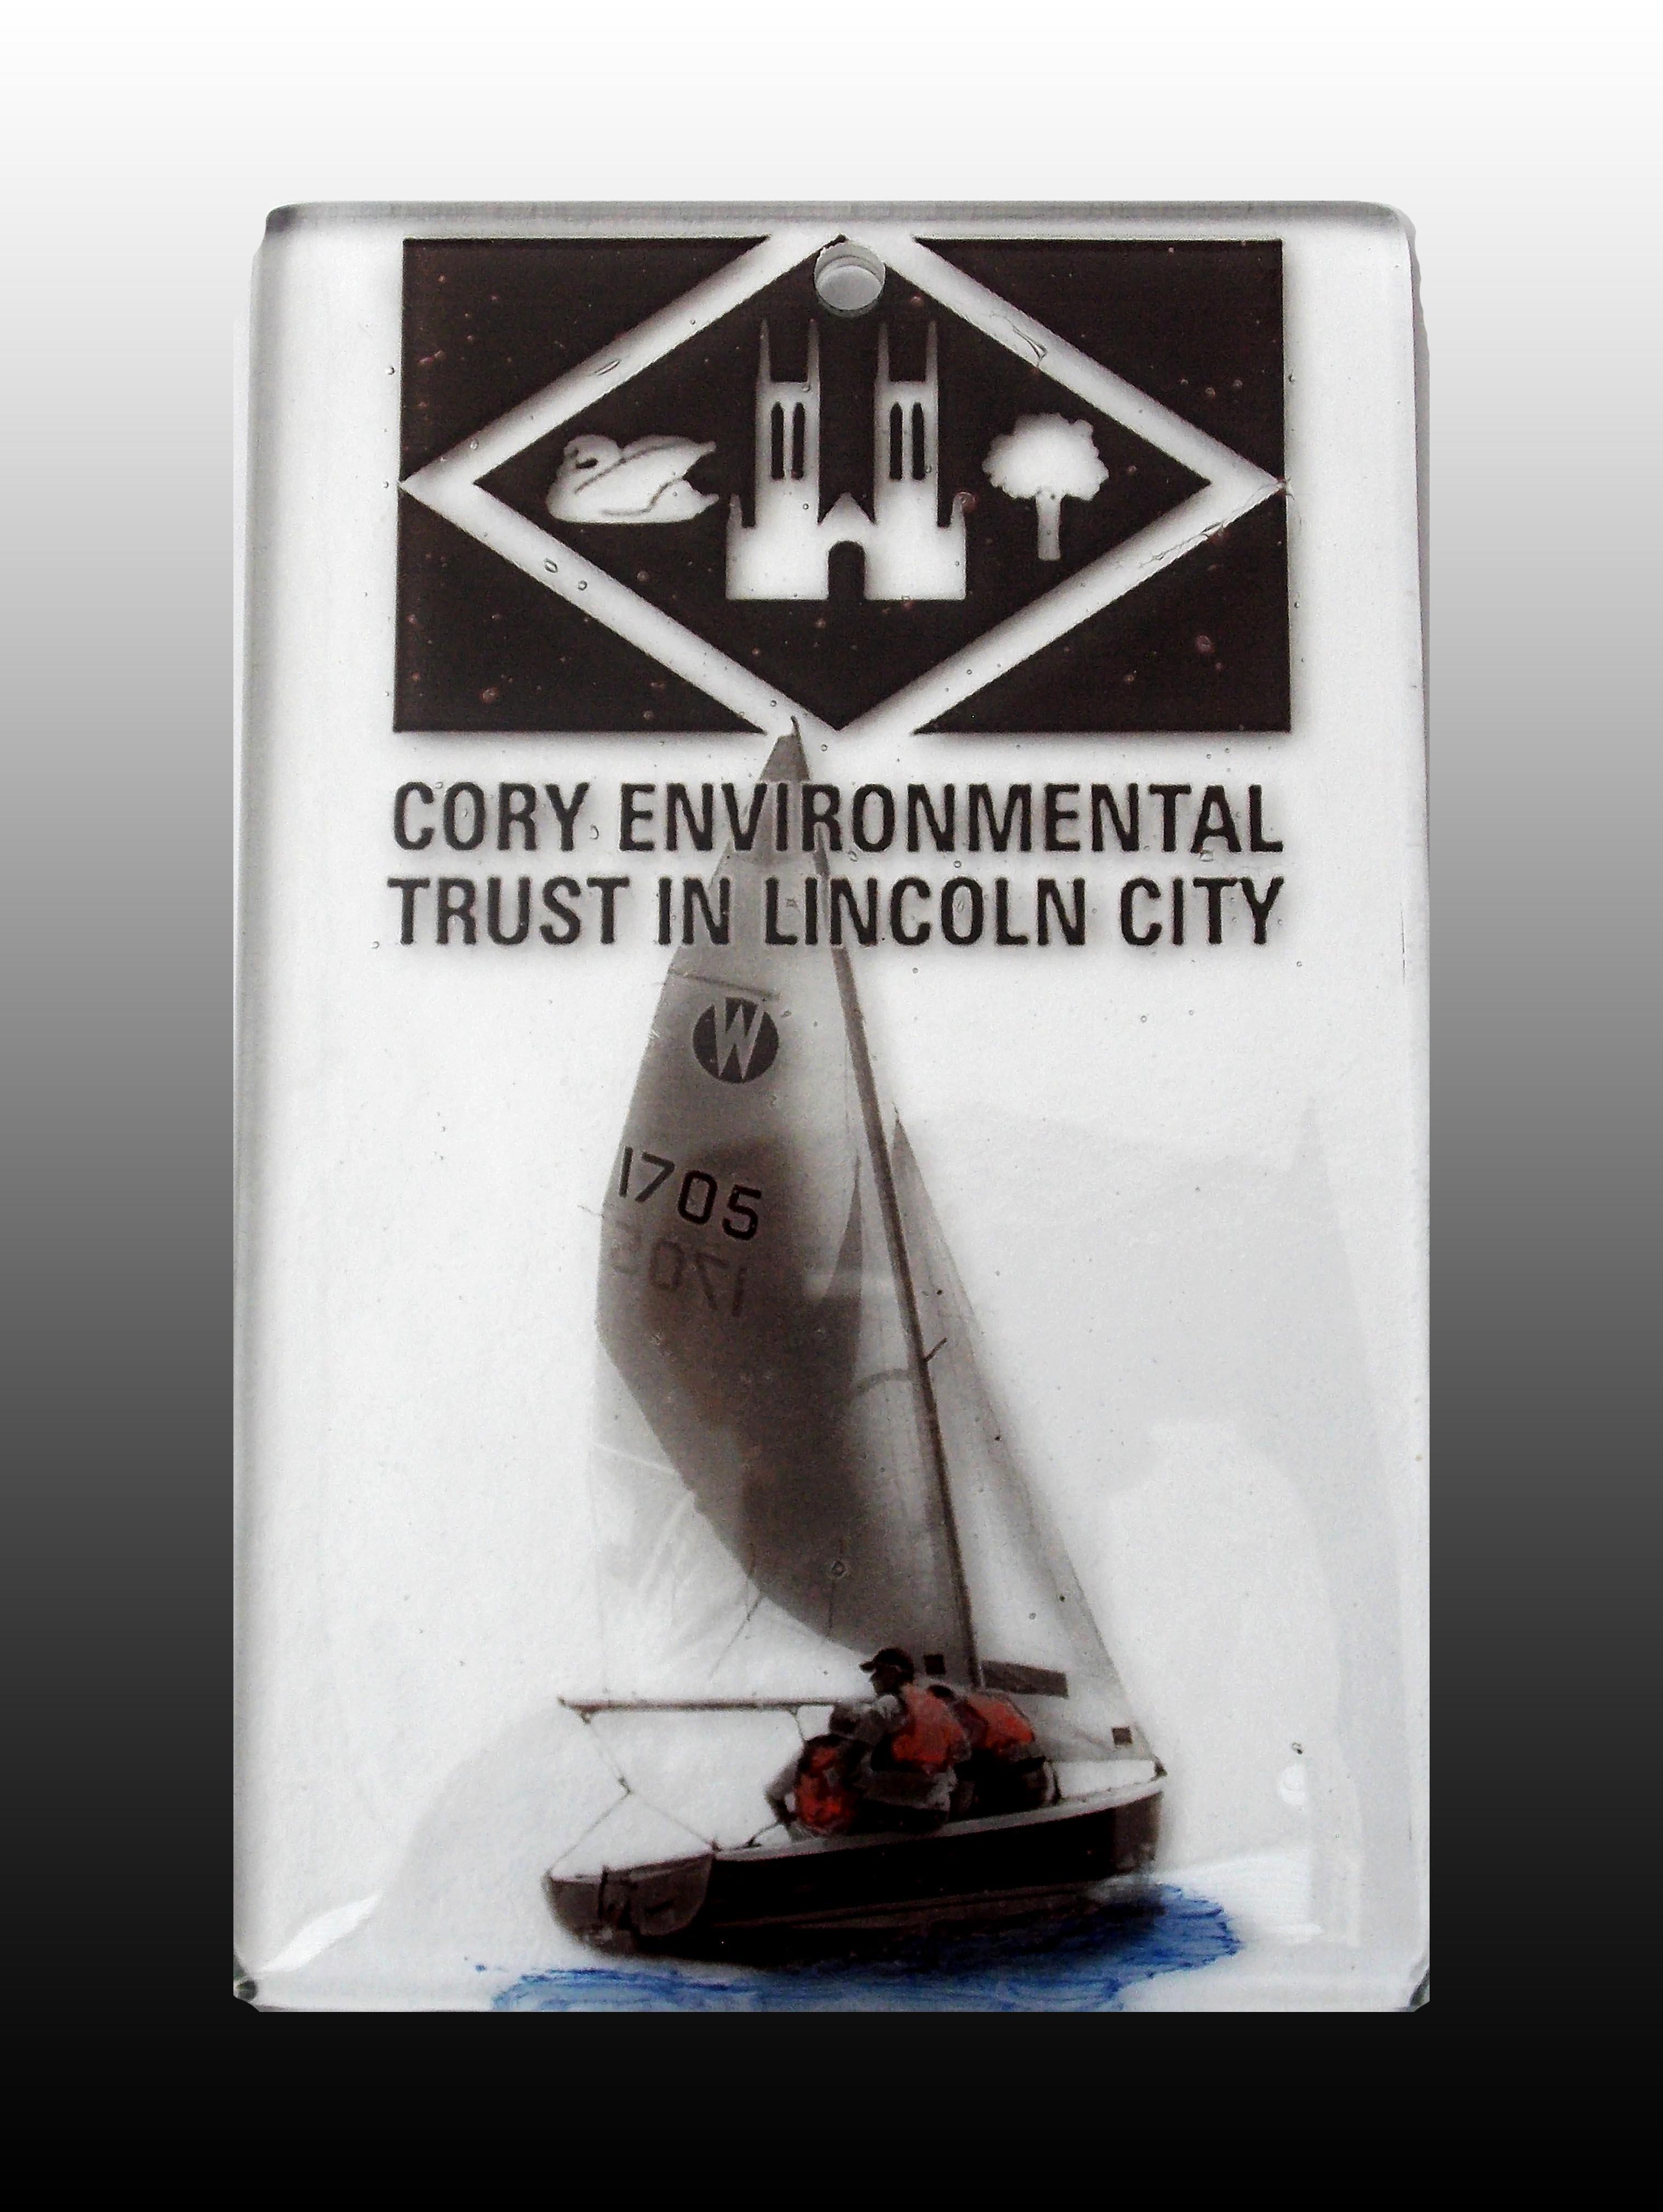 Cory Trust Plaque - Hykeham Sailing Club